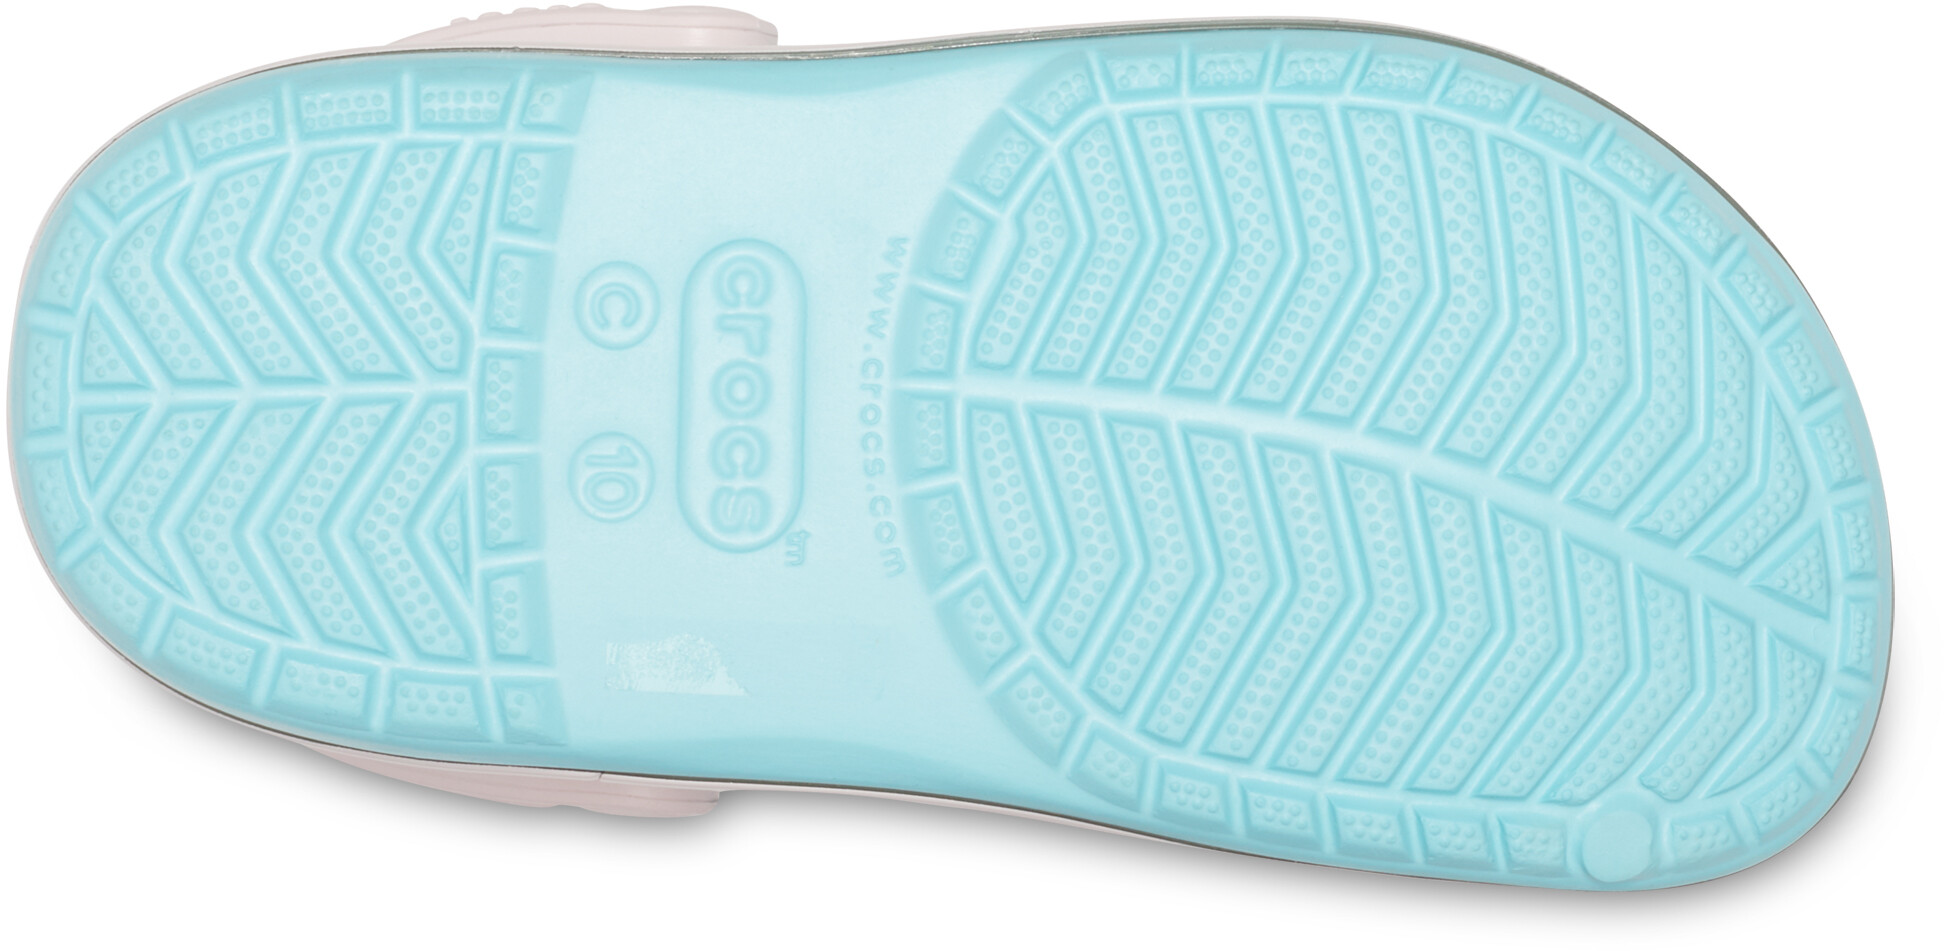 e95e9526fe07 Crocs Crocband MultiGraphic Sandals Children turquoise at Addnature ...